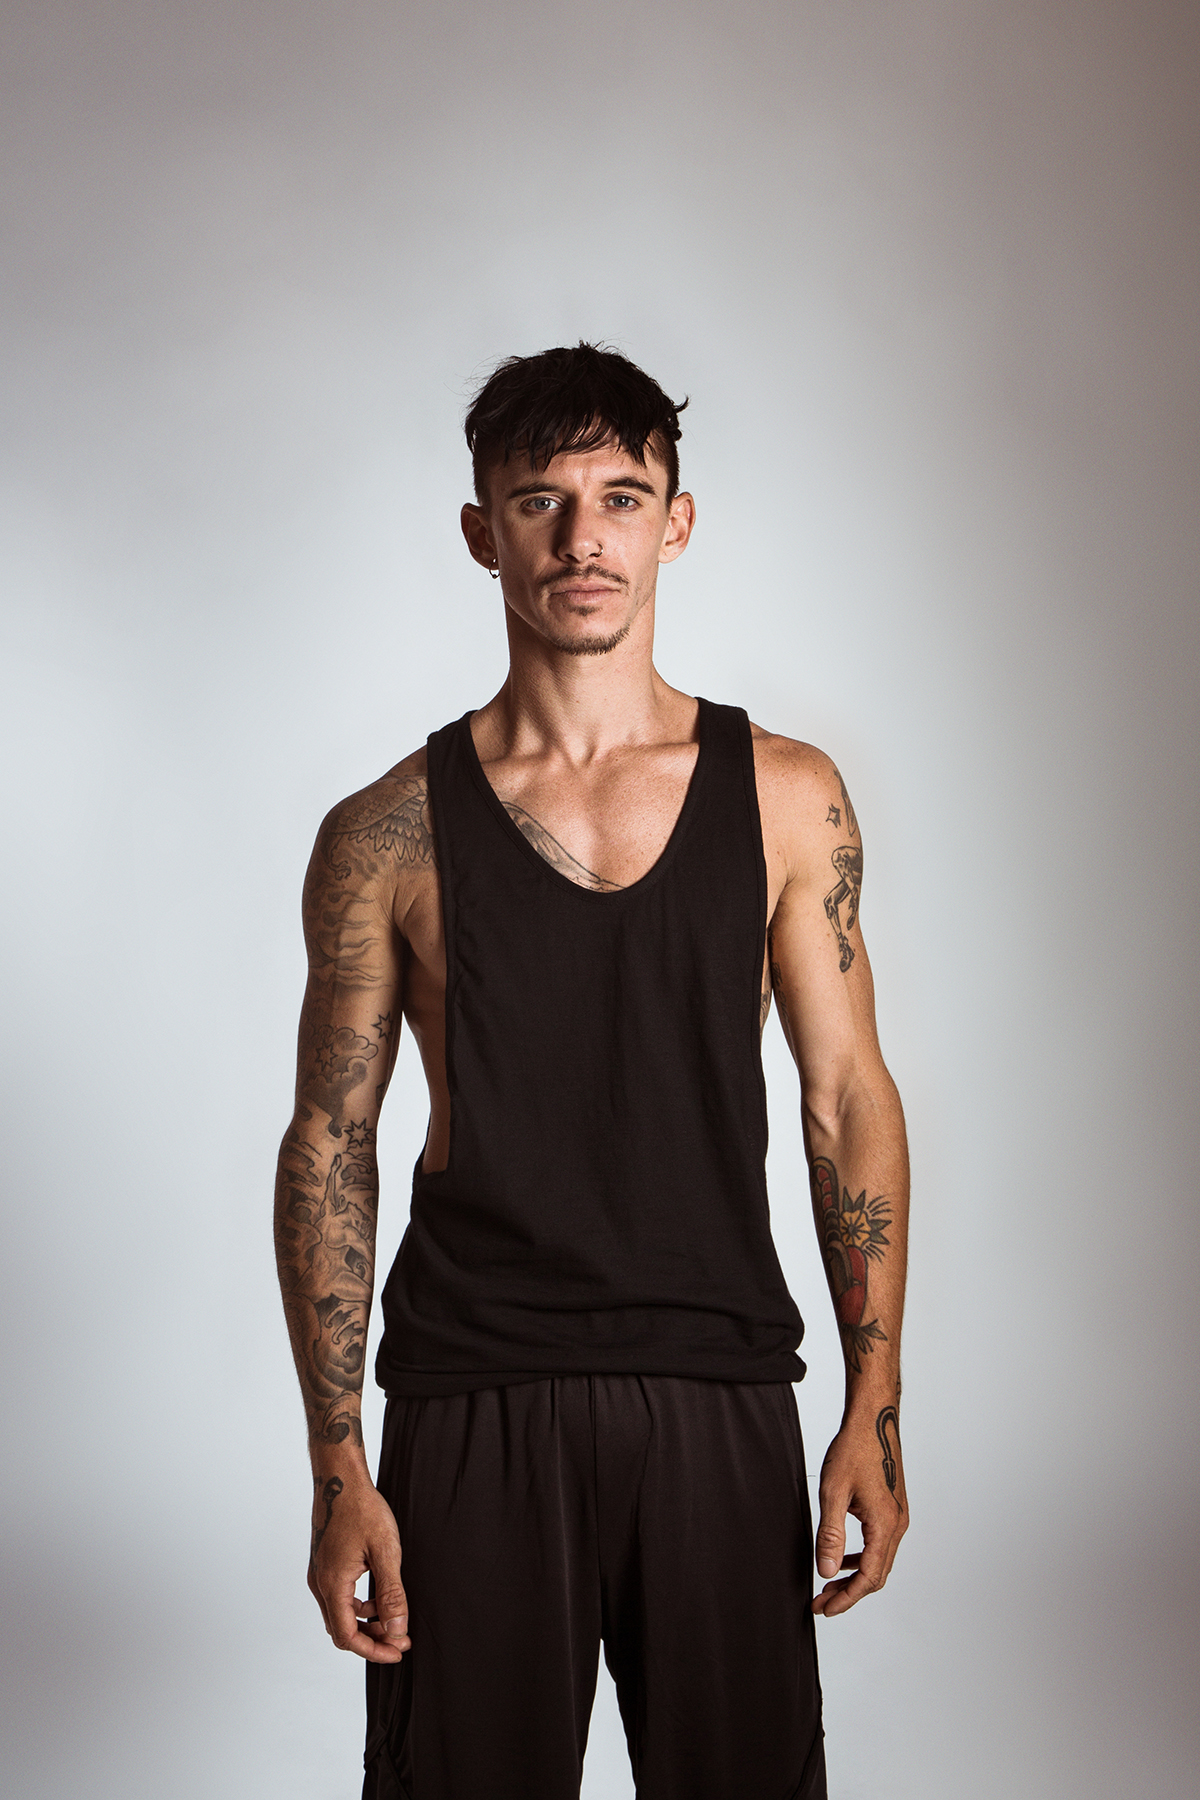 Brad wears the  Men's Cut Away Singlet  and  Urban Short  in Black